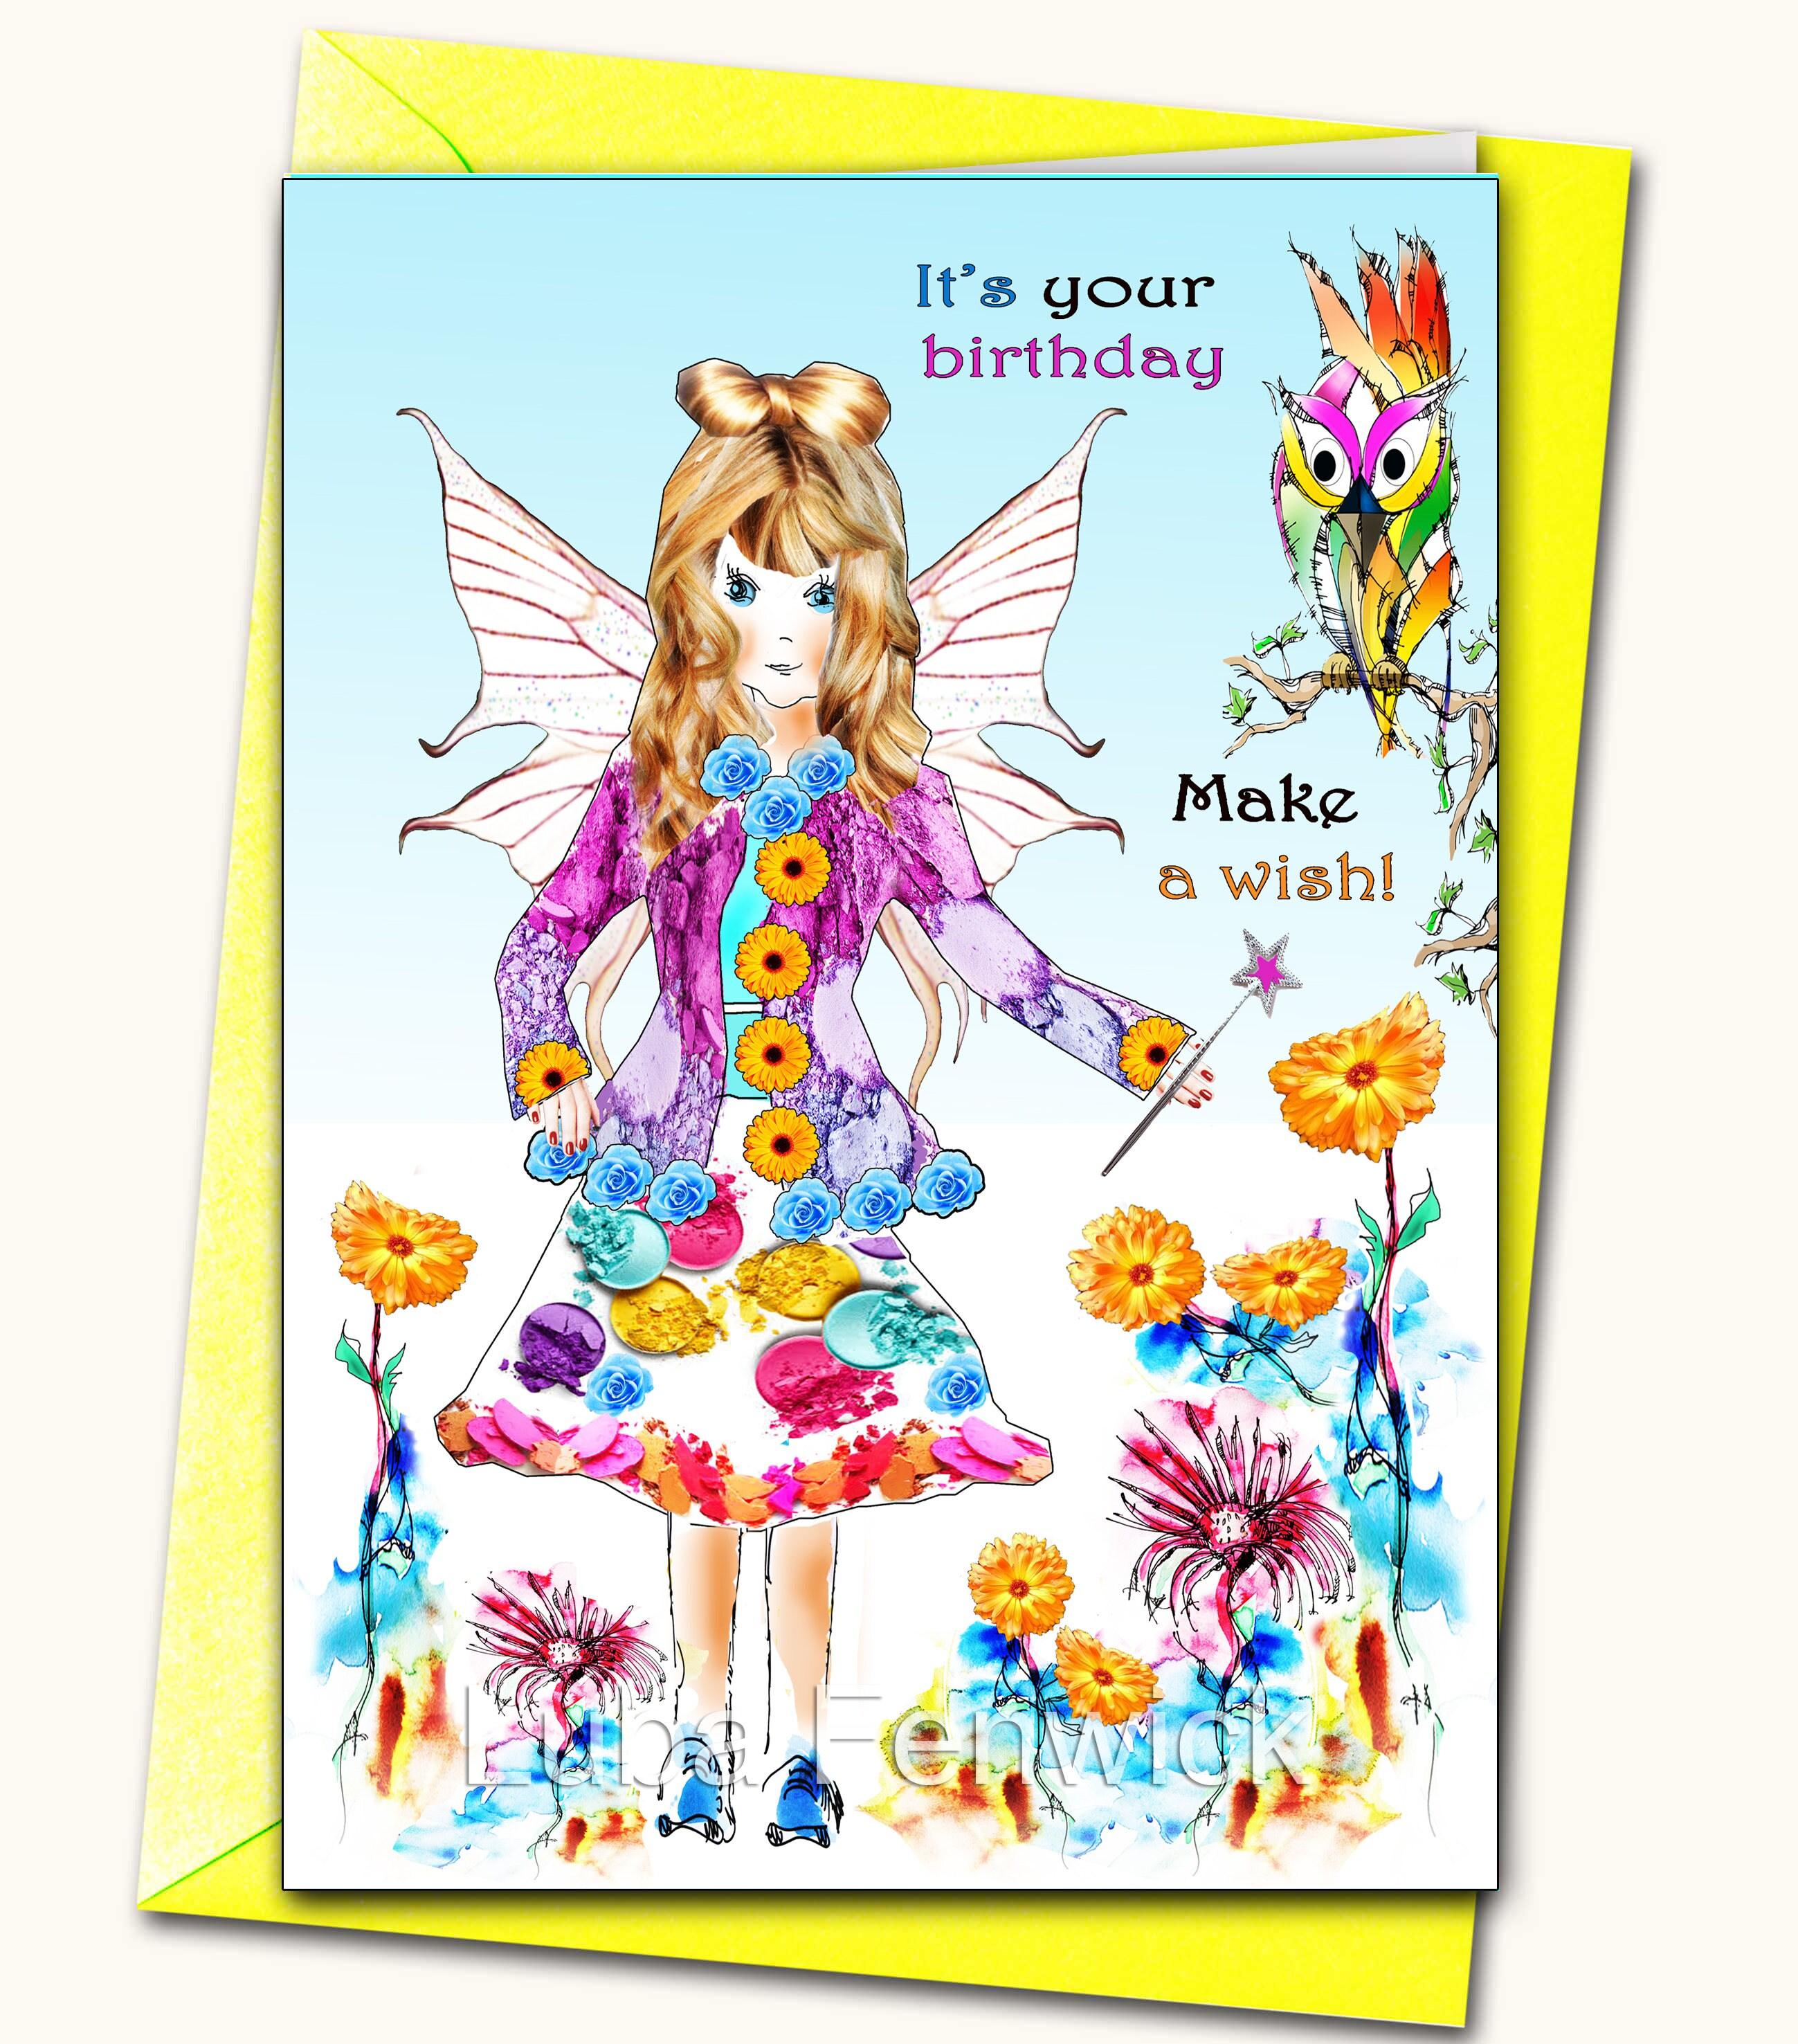 Happy Birthday Sister Friend Niece Daughter Girl Fairy